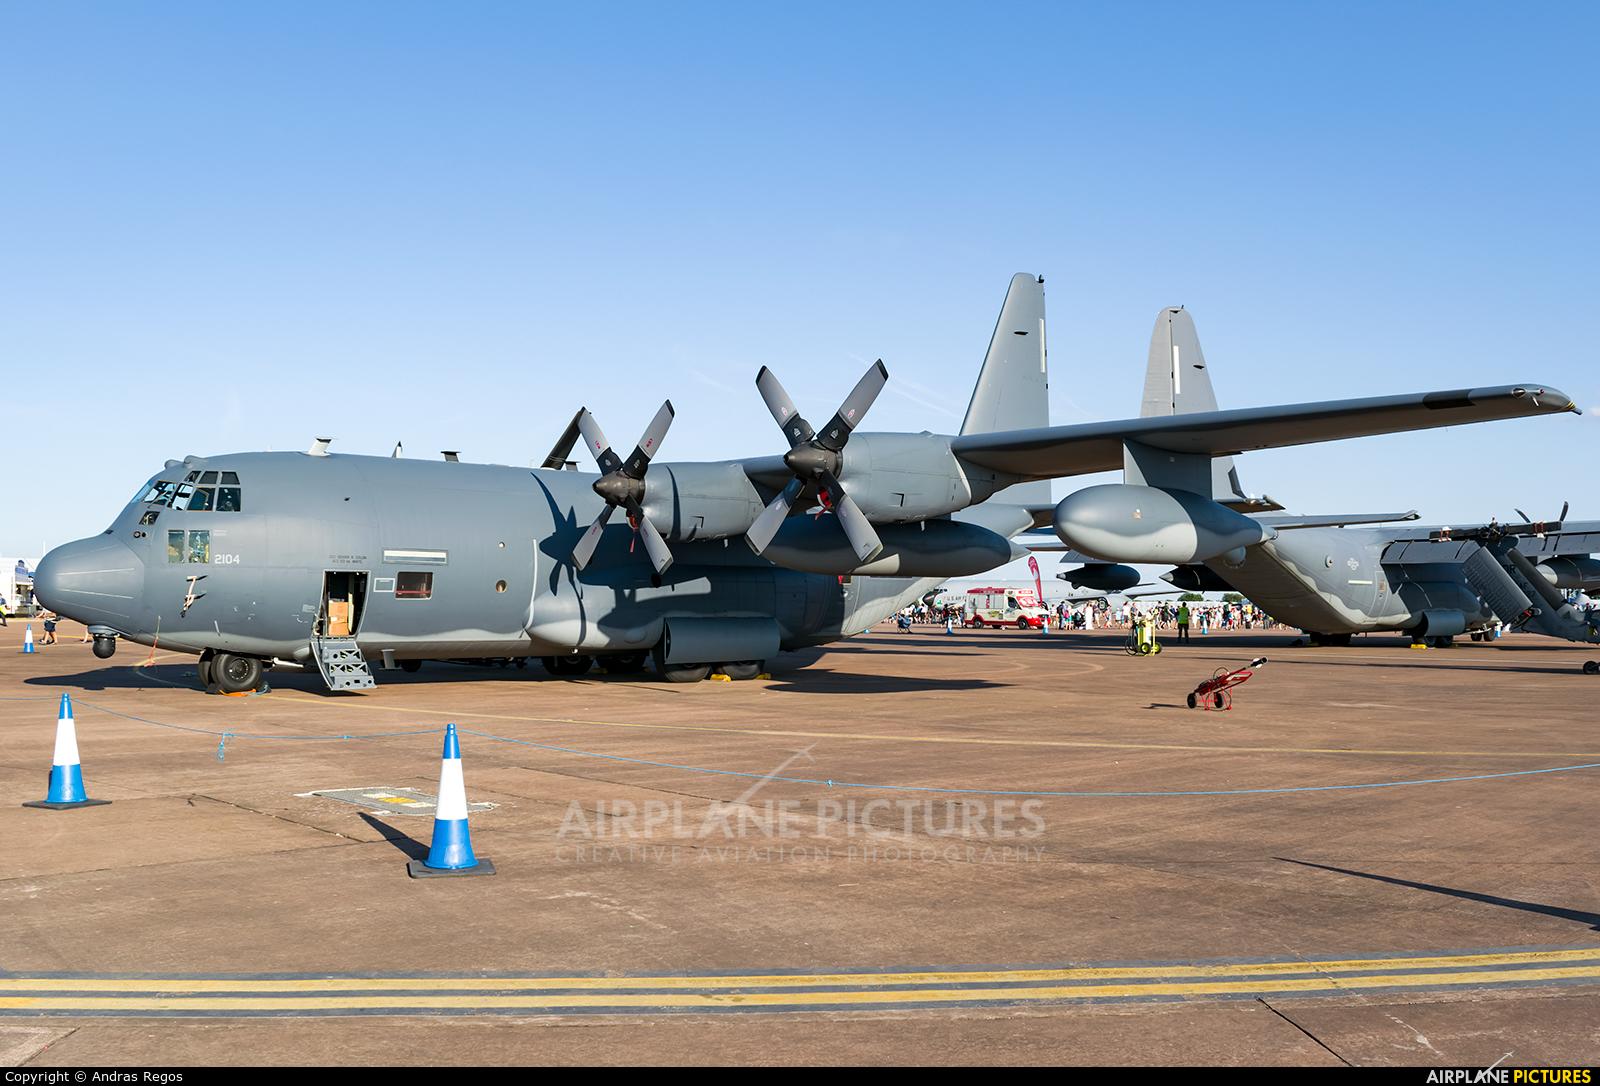 USA - Air Force 92-2104 aircraft at Fairford